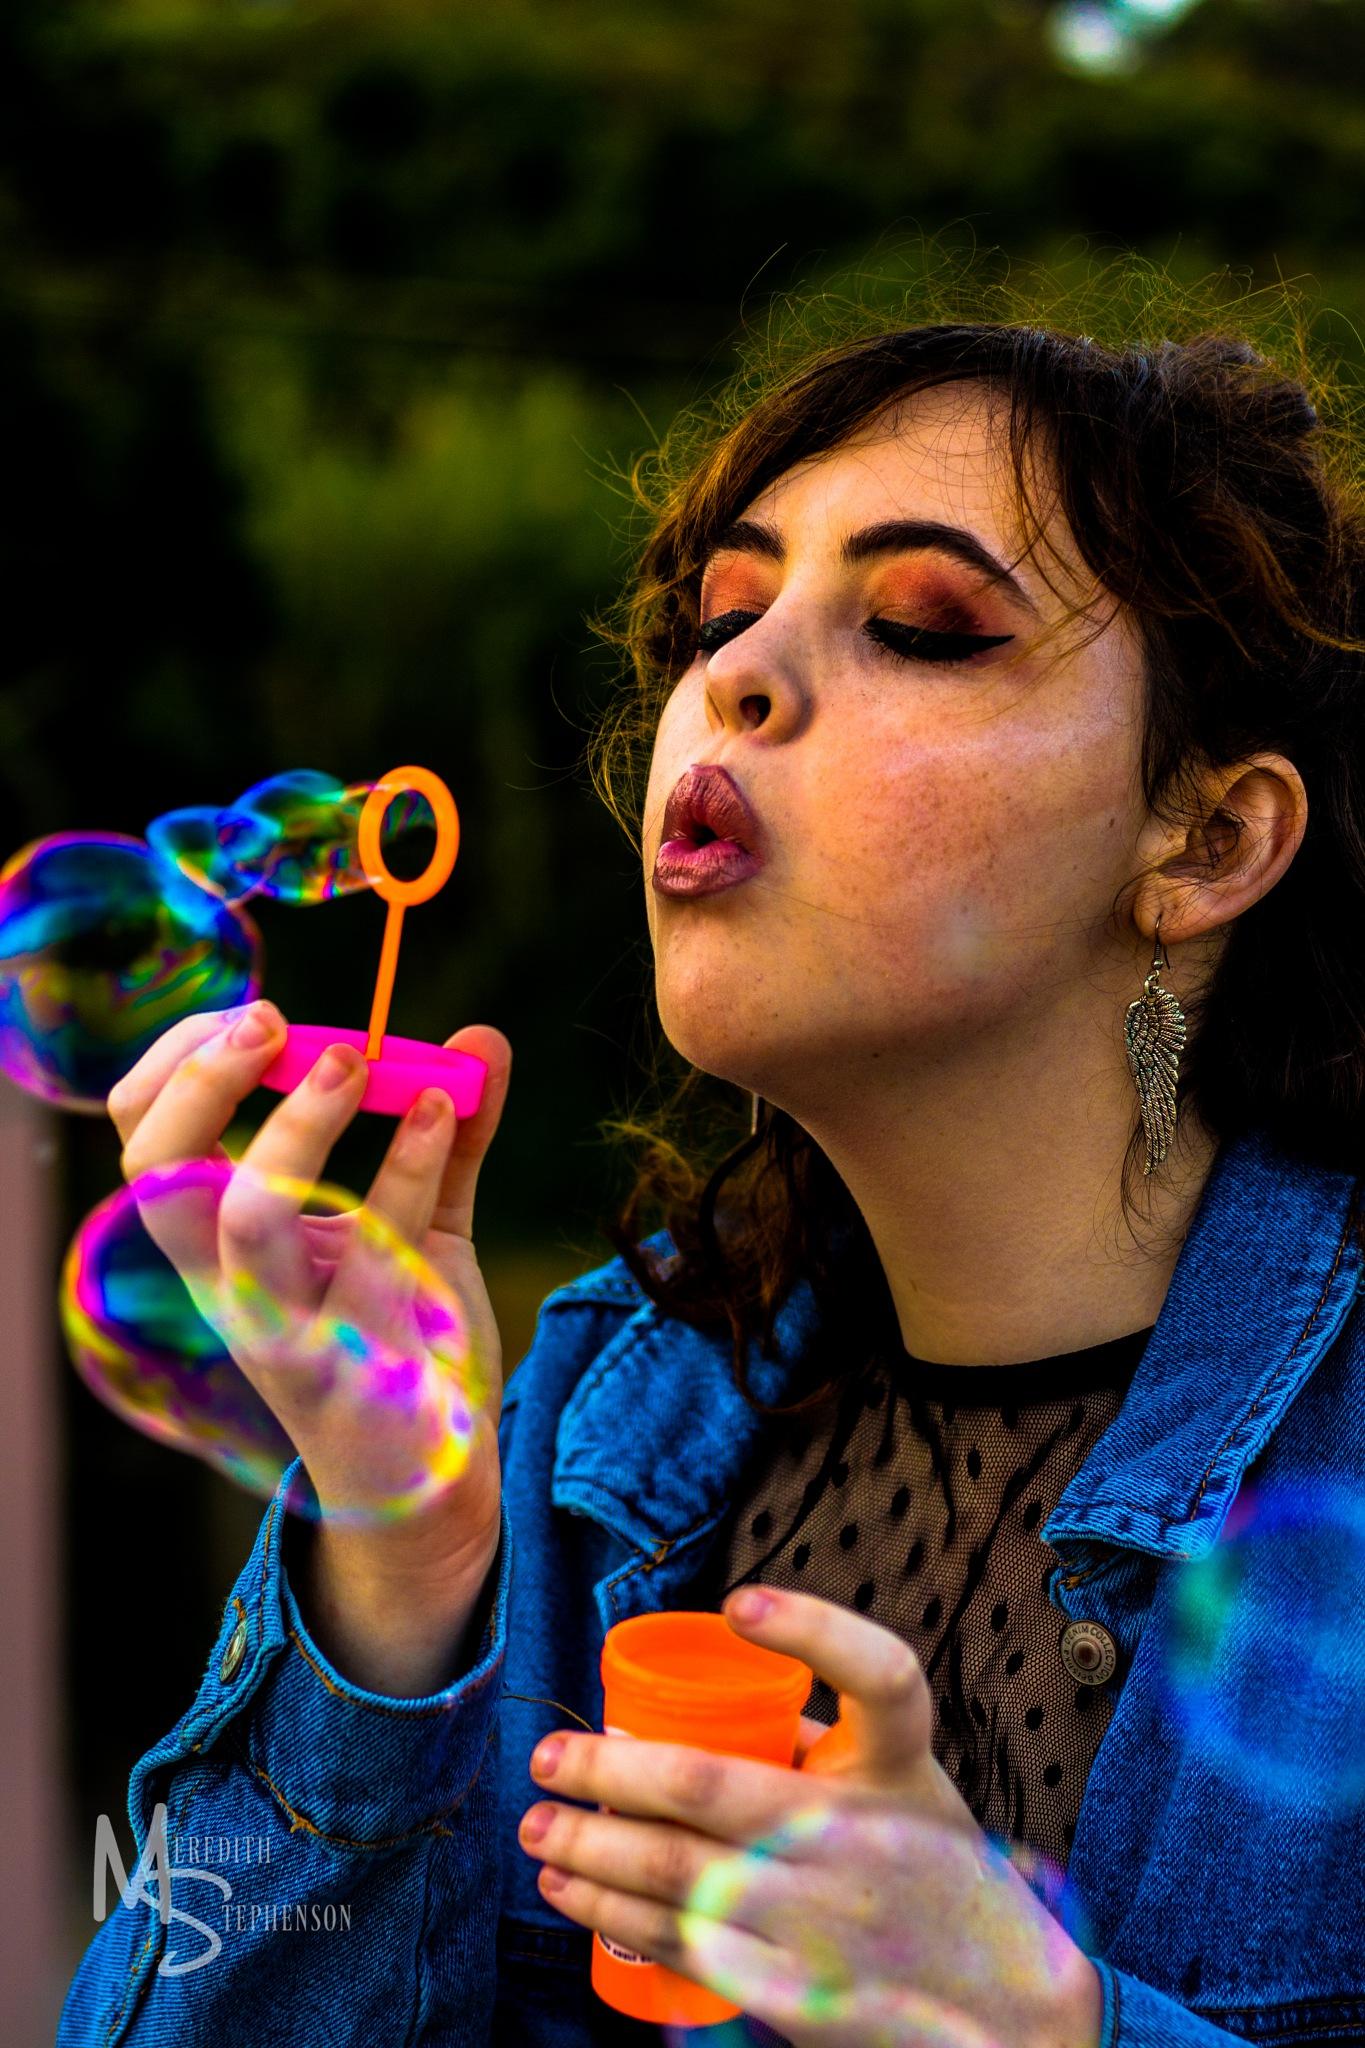 Technicolour Bubbles by Meredith Stephenson